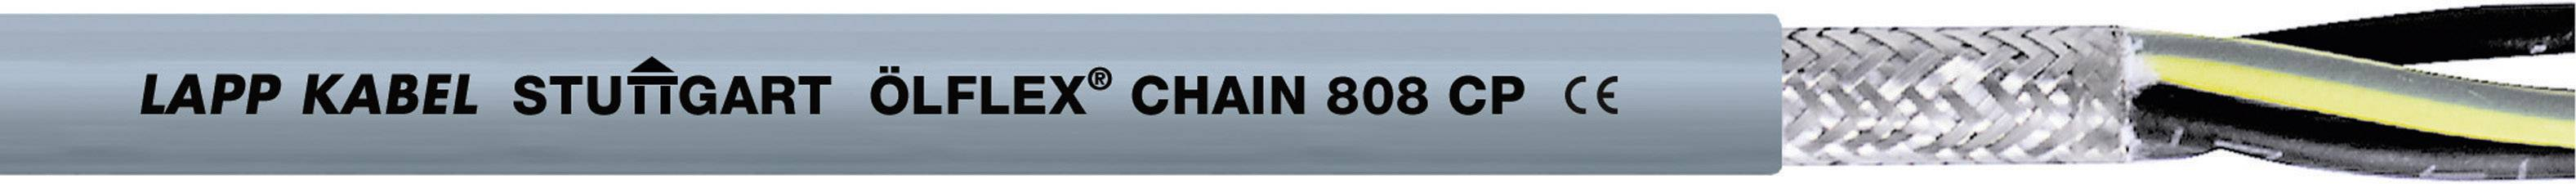 Žíla kabelu LappKabel ÖLFLEX CHAIN 808 CP 4G2,5 (1027784), 4x 2,5 mm², polyurethan, Ø 10,1 mm, stíněný, 100 m,